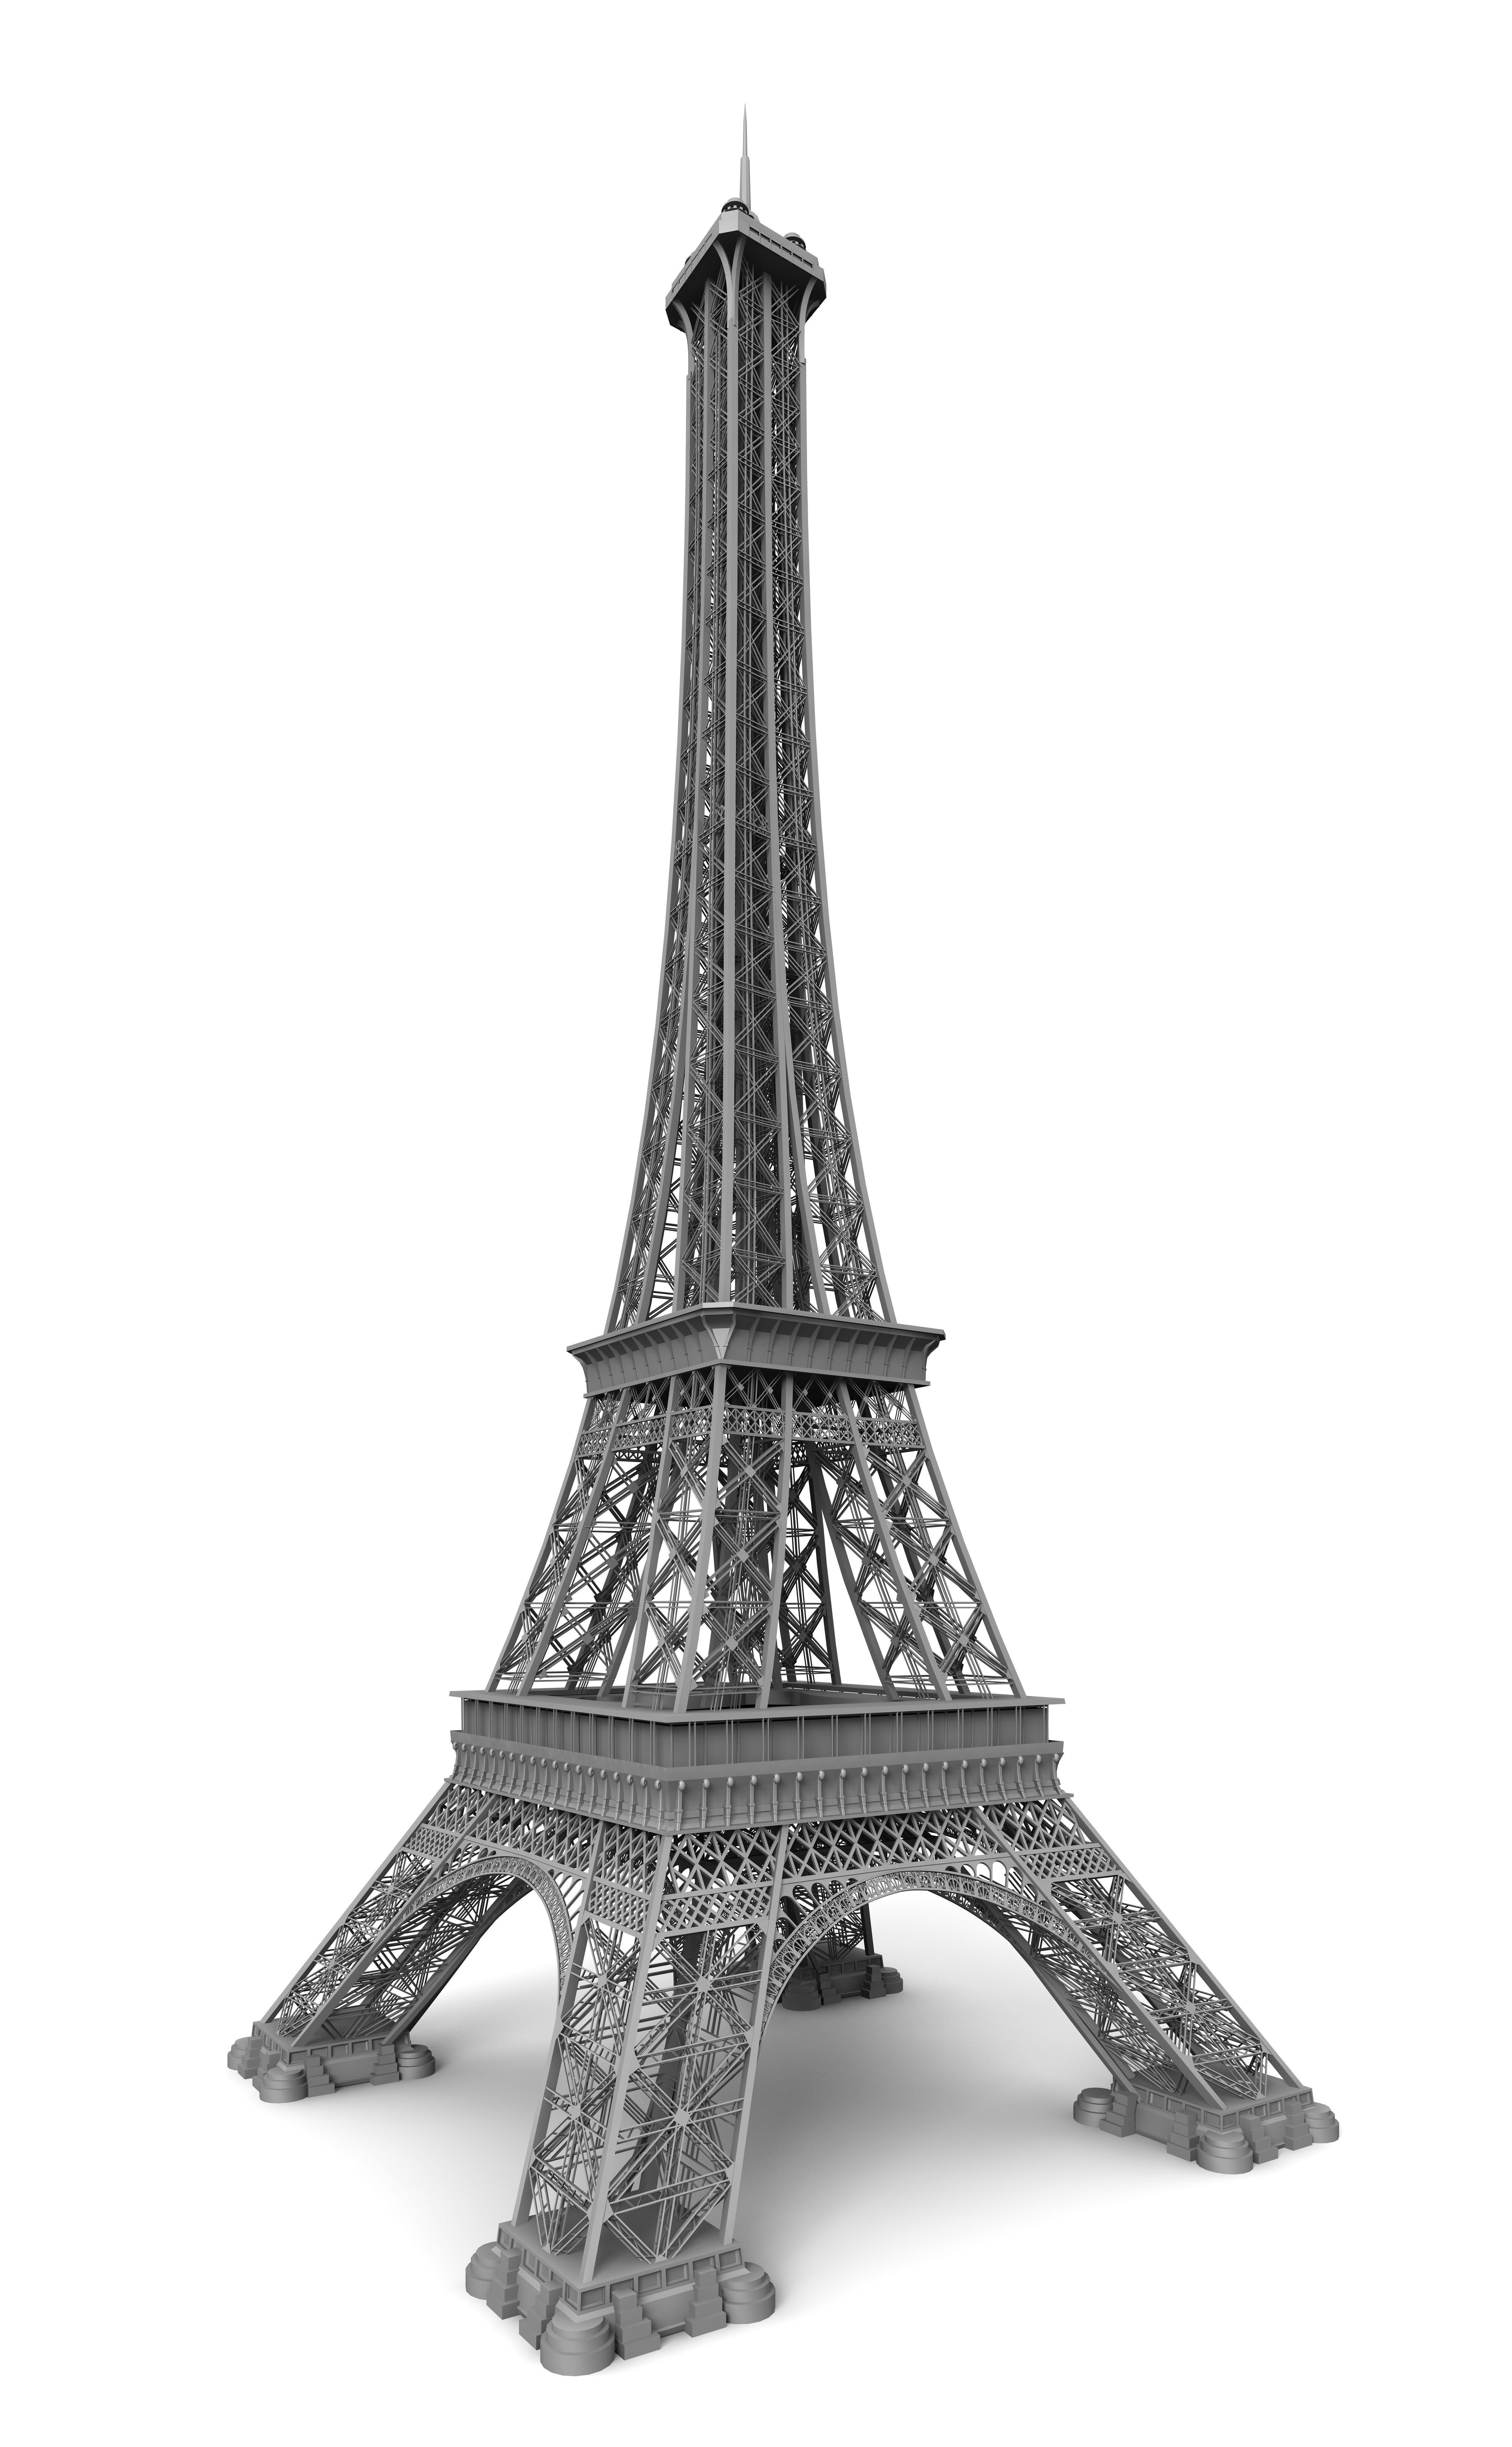 Eiffel Tower Paris 3D Model 3DS C4D DAE SKP | CGTrader.com